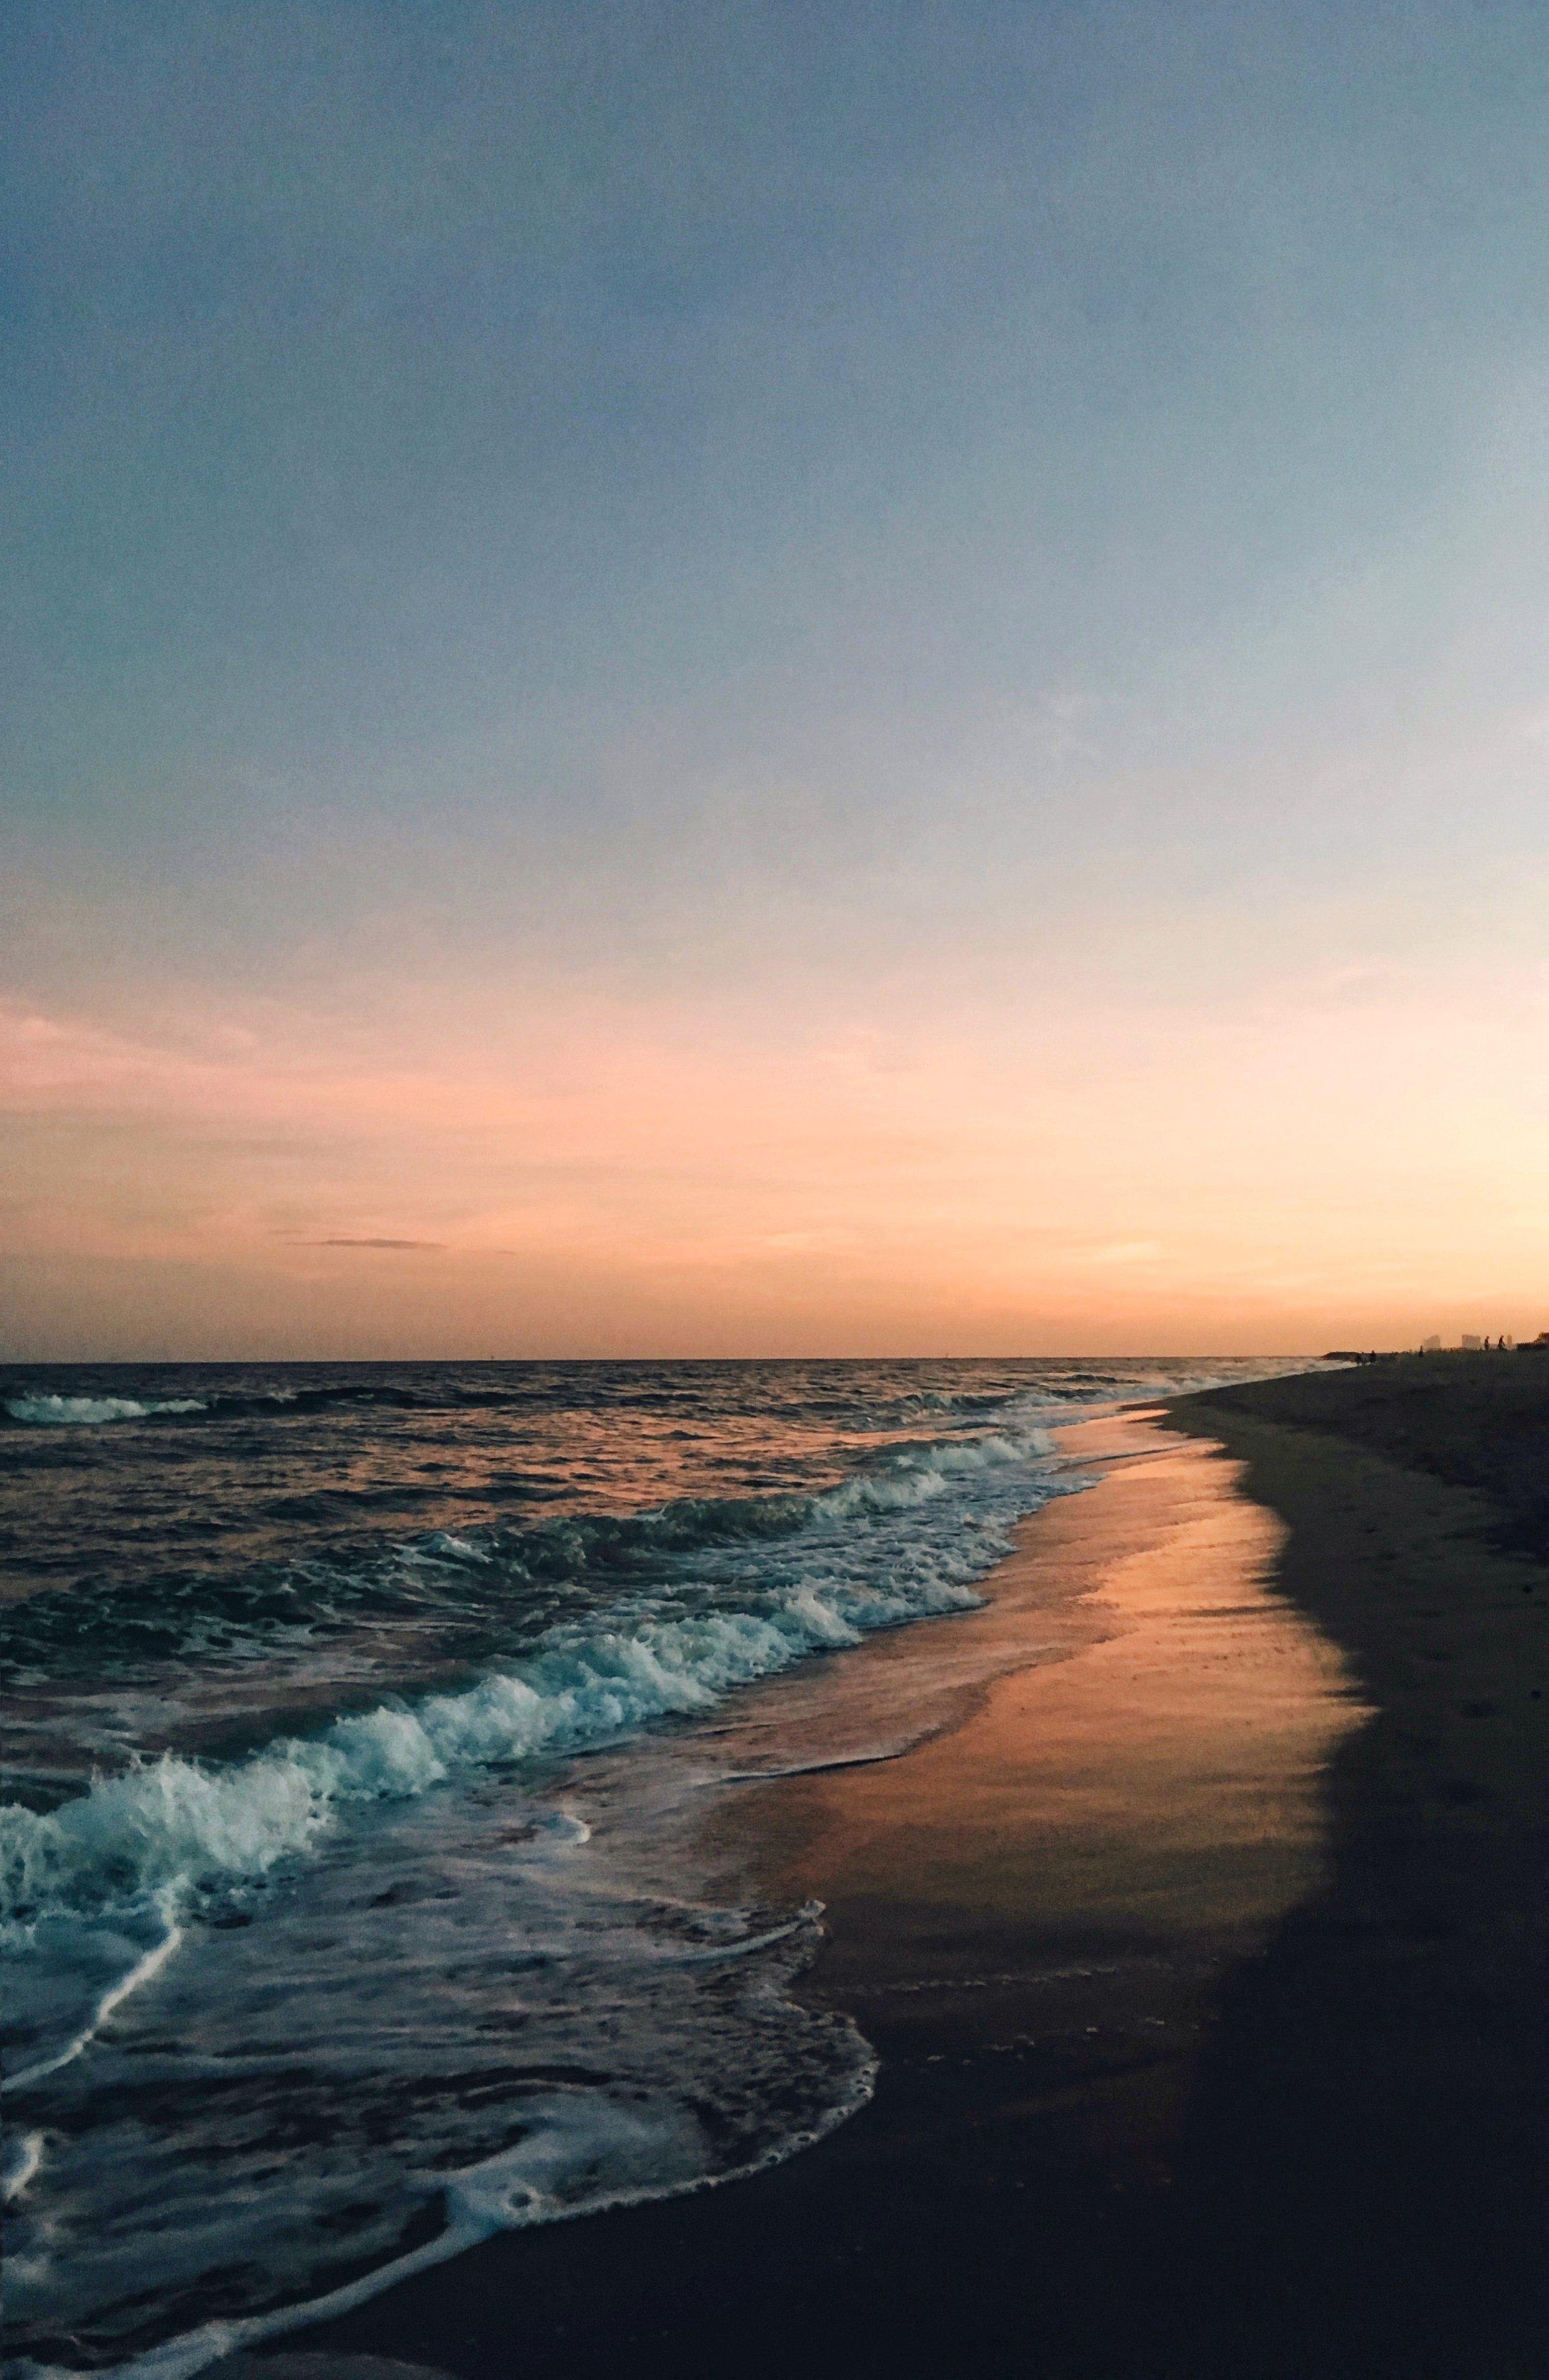 Fort Lauderdale Beaches